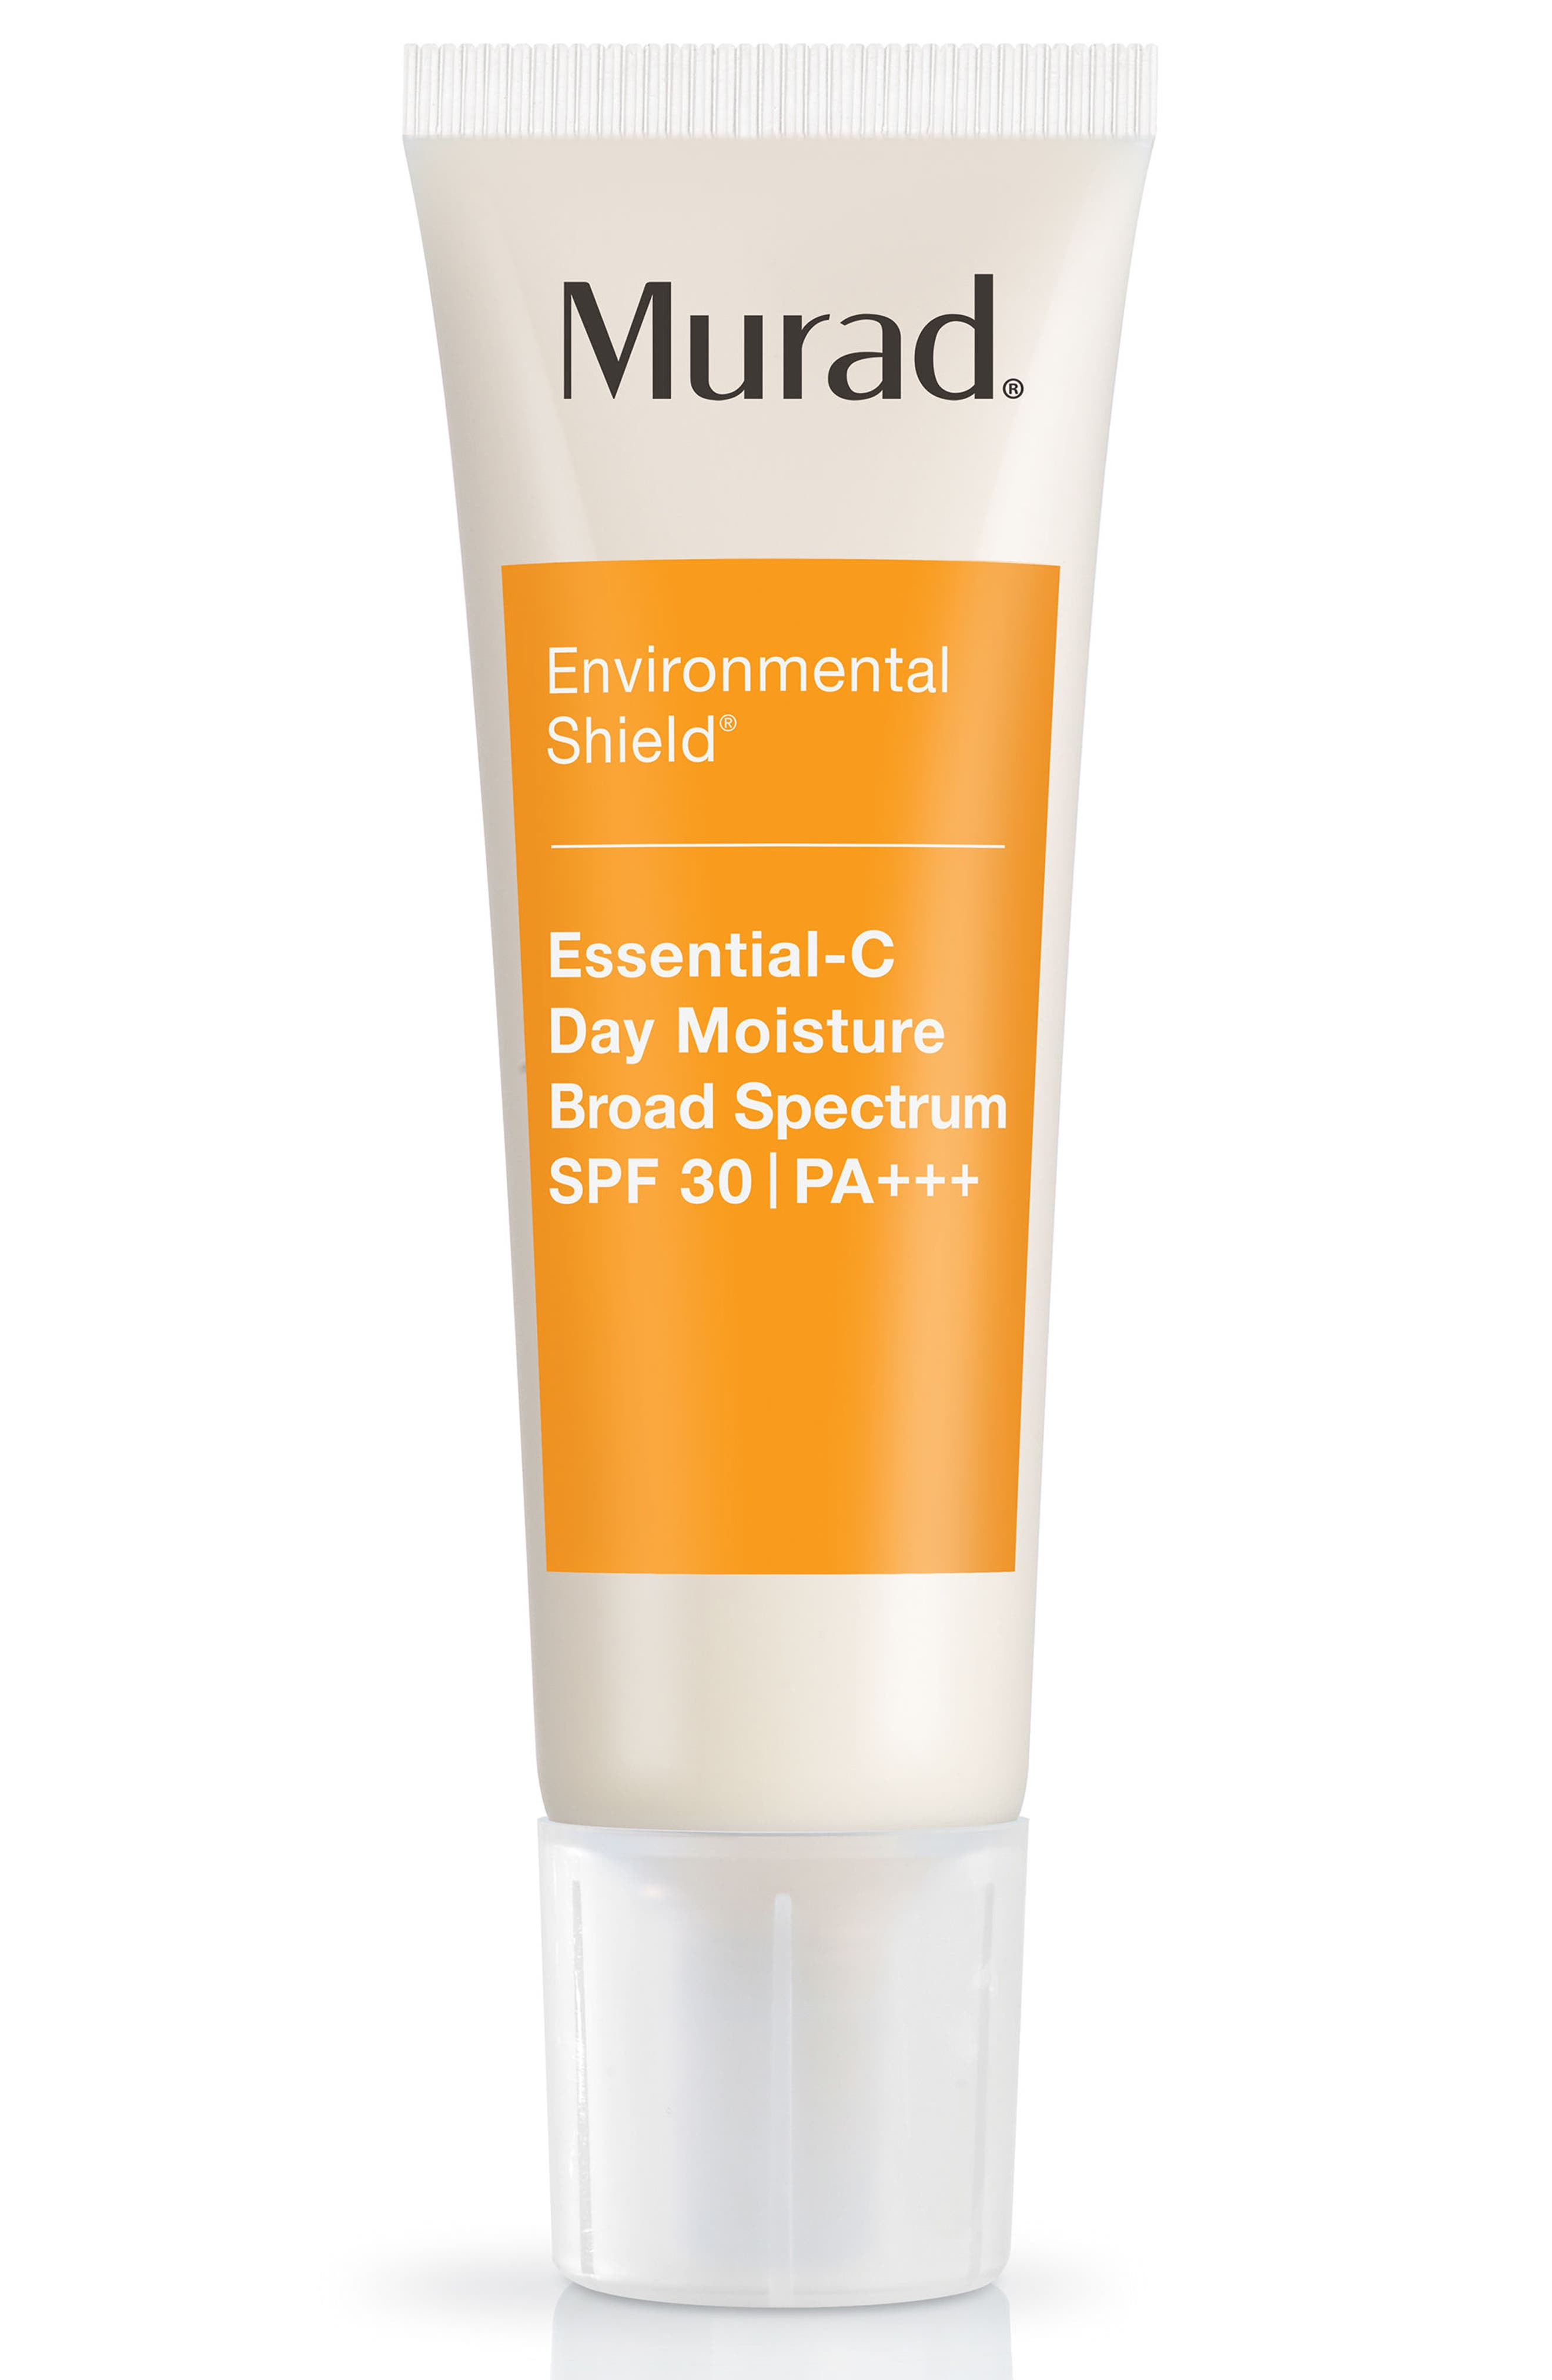 Murad® Essential-C Day Moisture Broad Spectrum SPF 30 PA+++